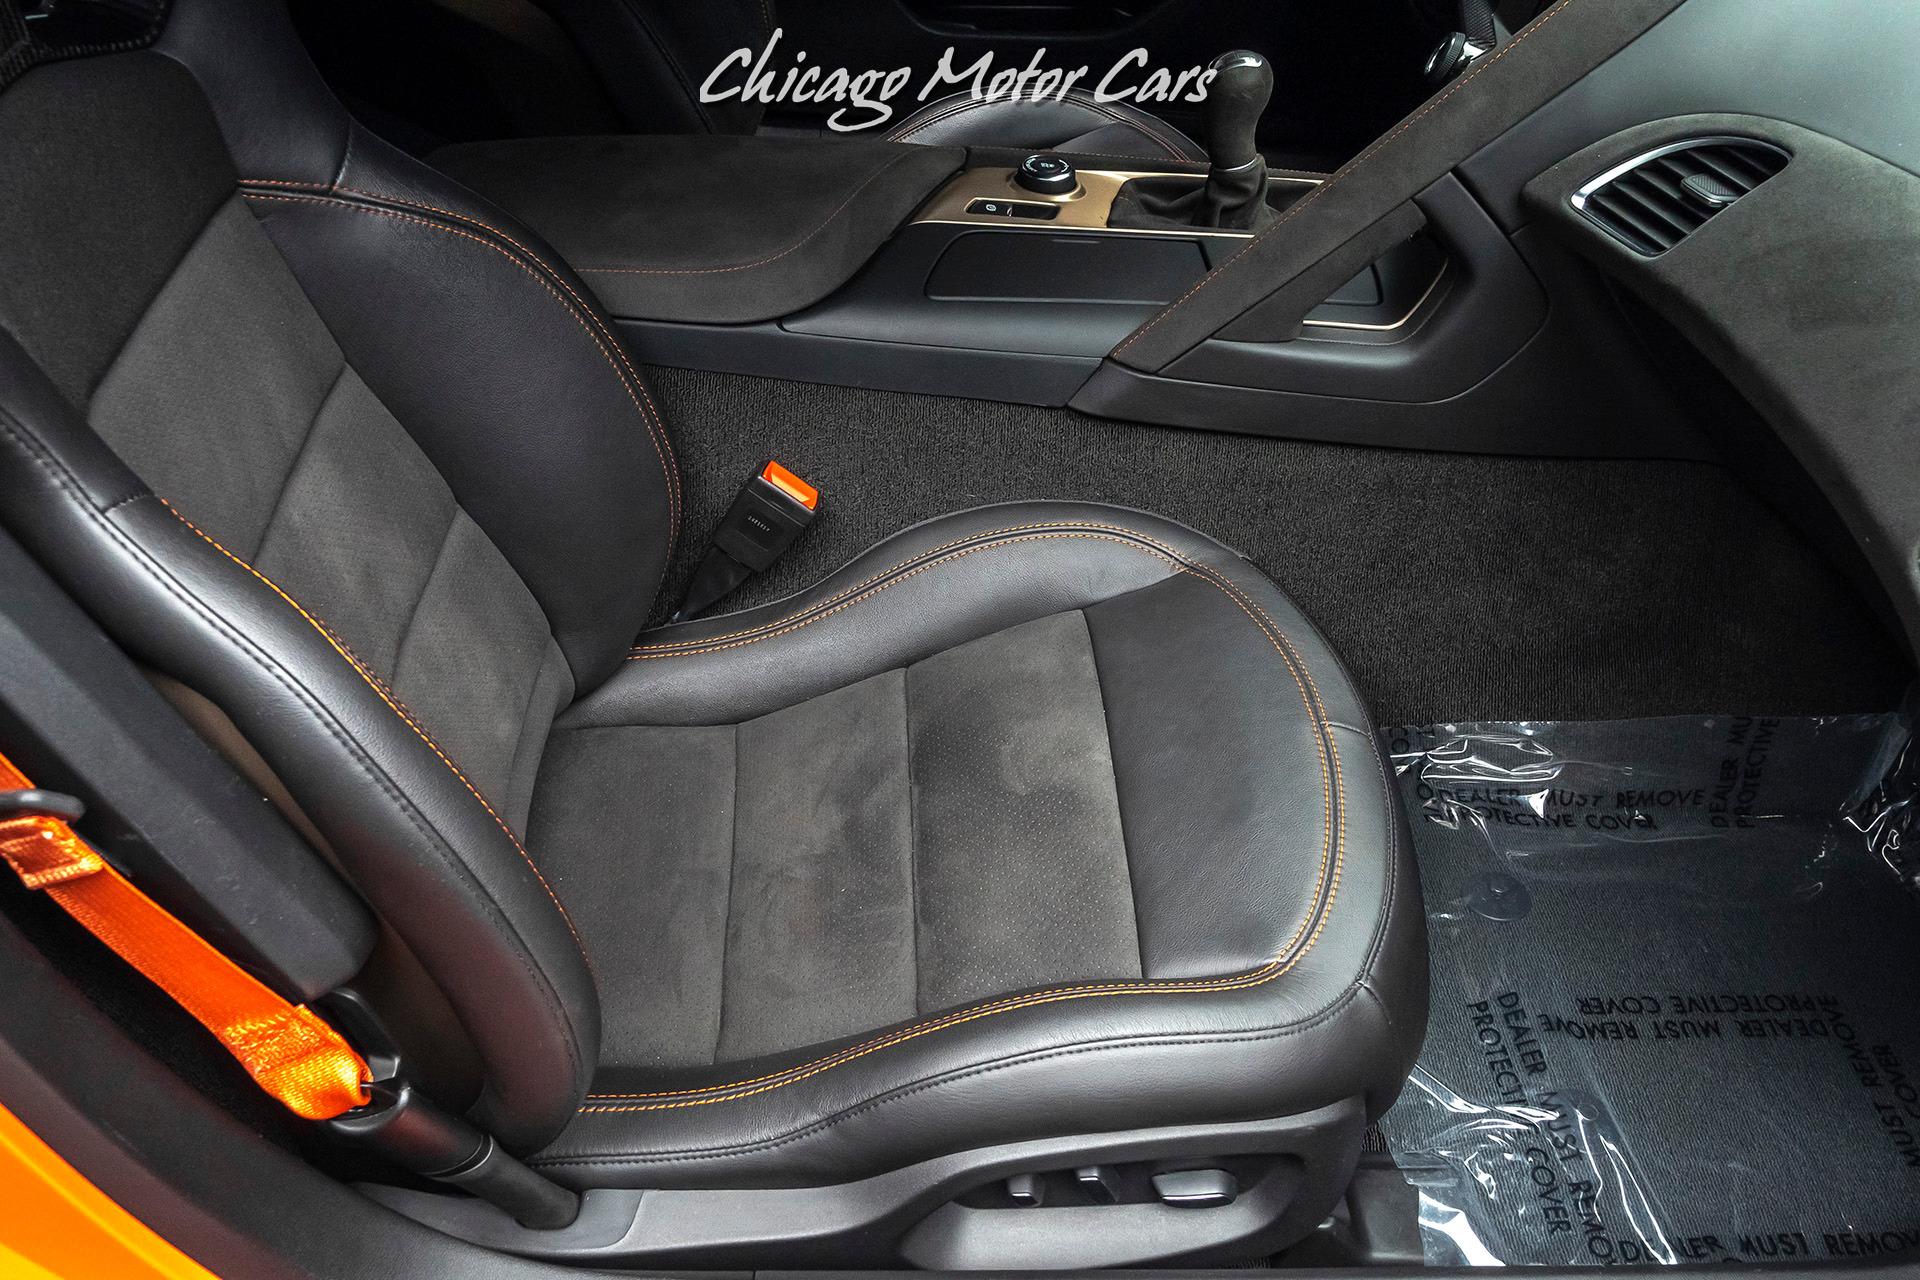 Used-2019-Chevrolet-Corvette-ZR1-3ZR-Coupe-7-SPEED-MANUAL-TRACK-PERFORMANCE-PKG-ORANGE-DESIGN-PKG